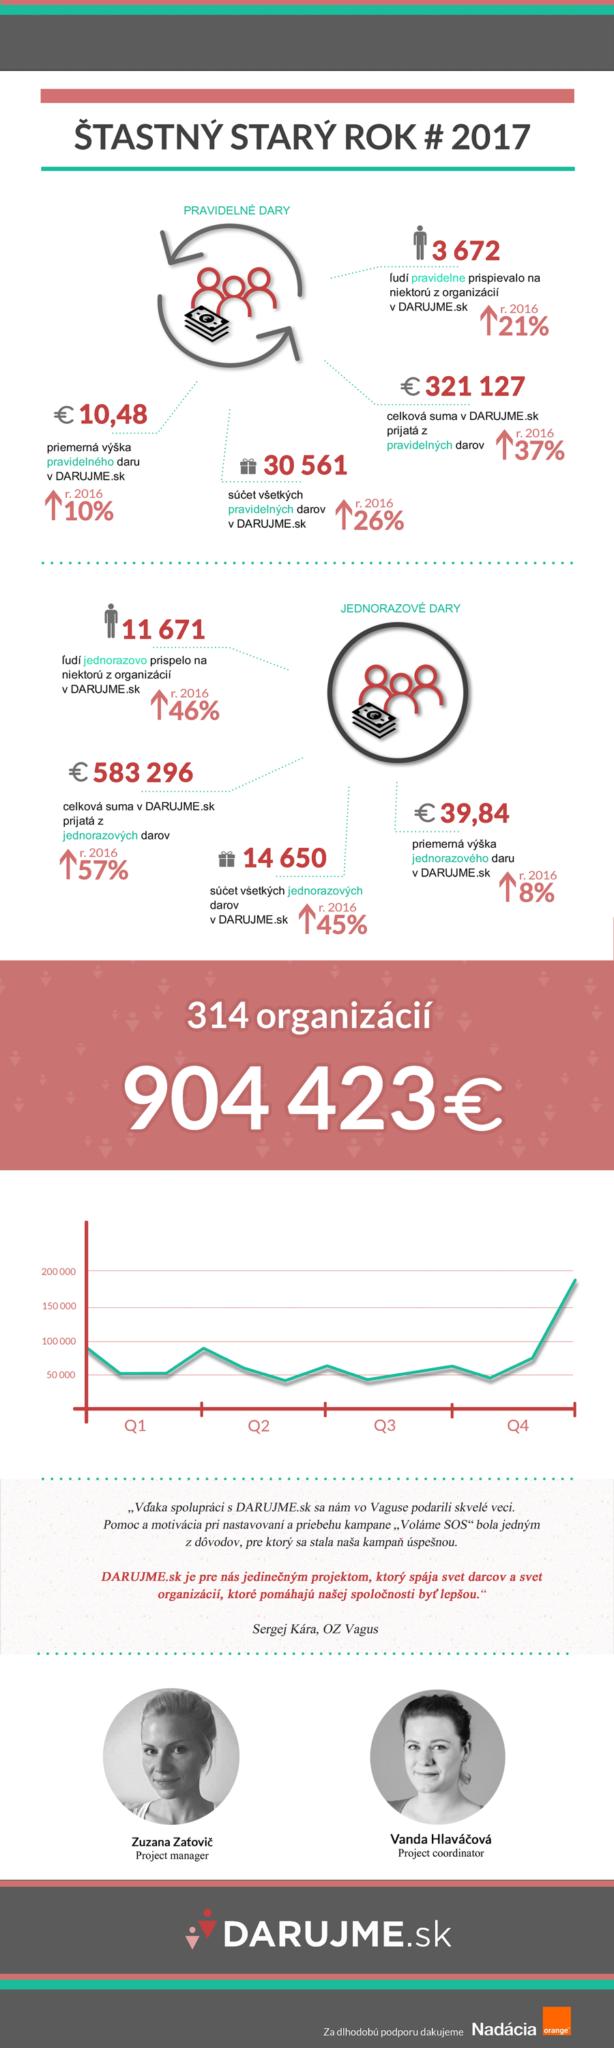 DARUJME.sk v roku 2017